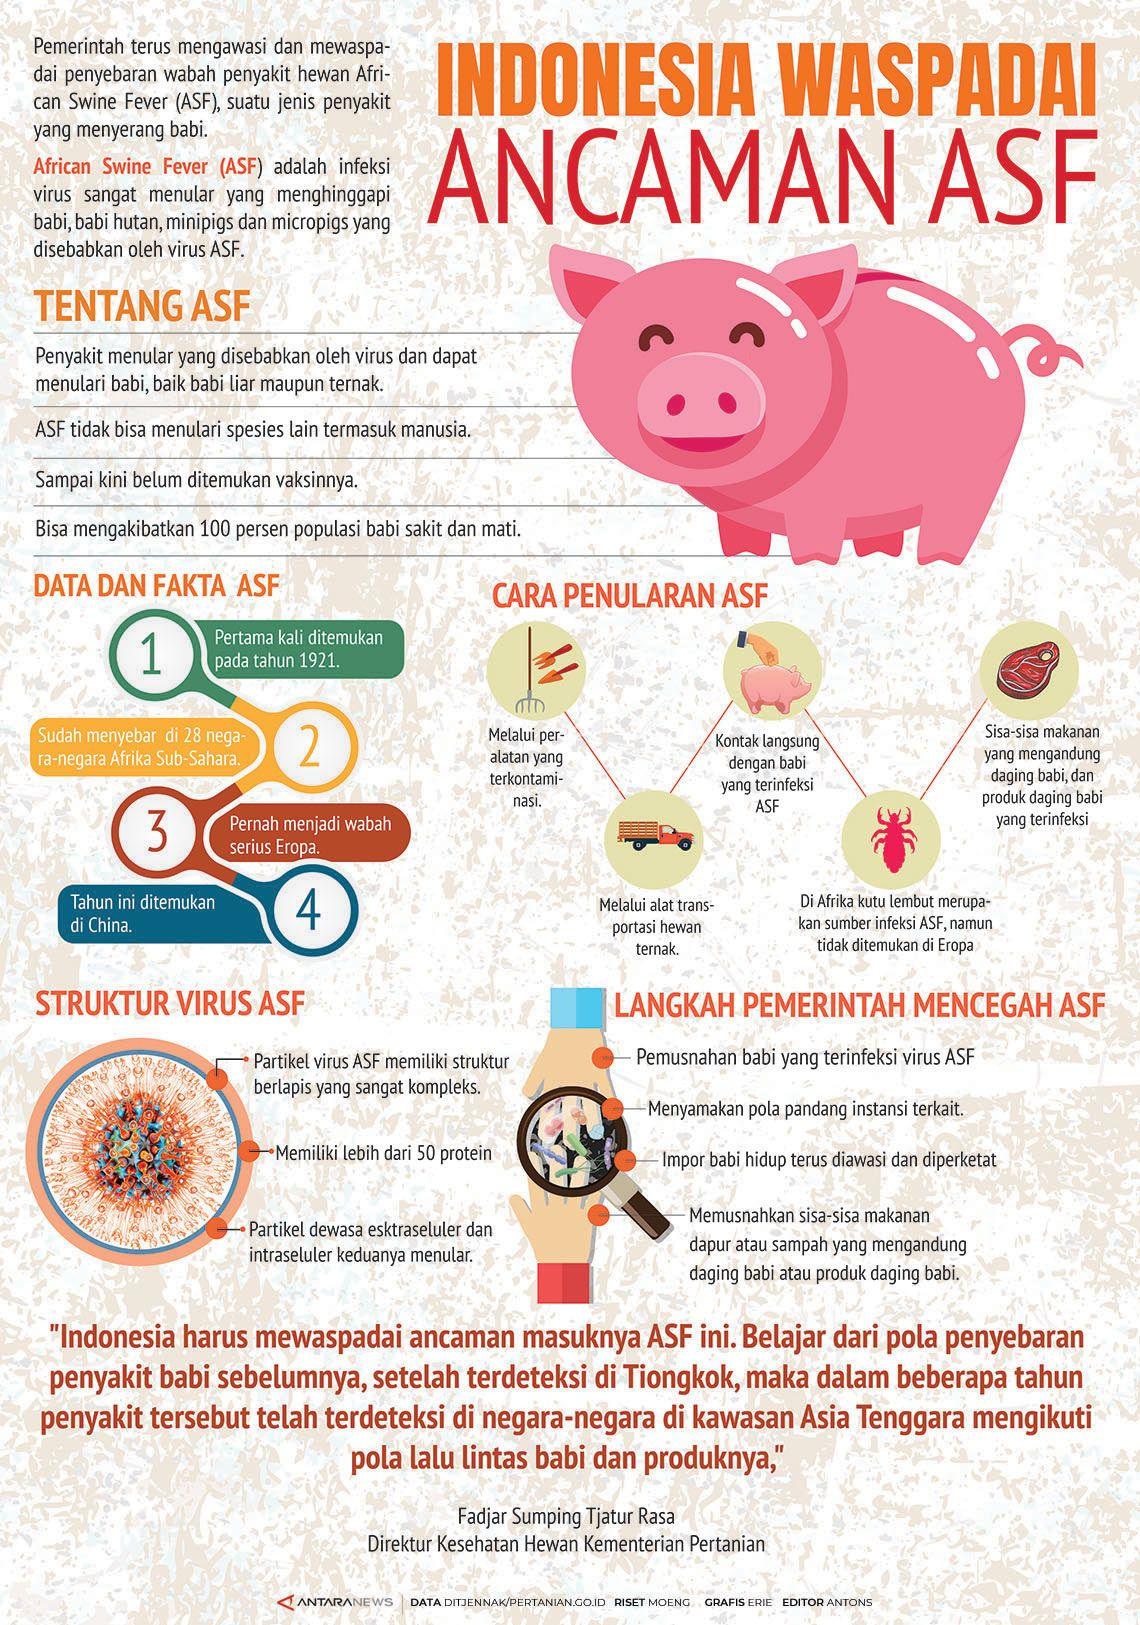 Indonesia waspadai ancaman ASF